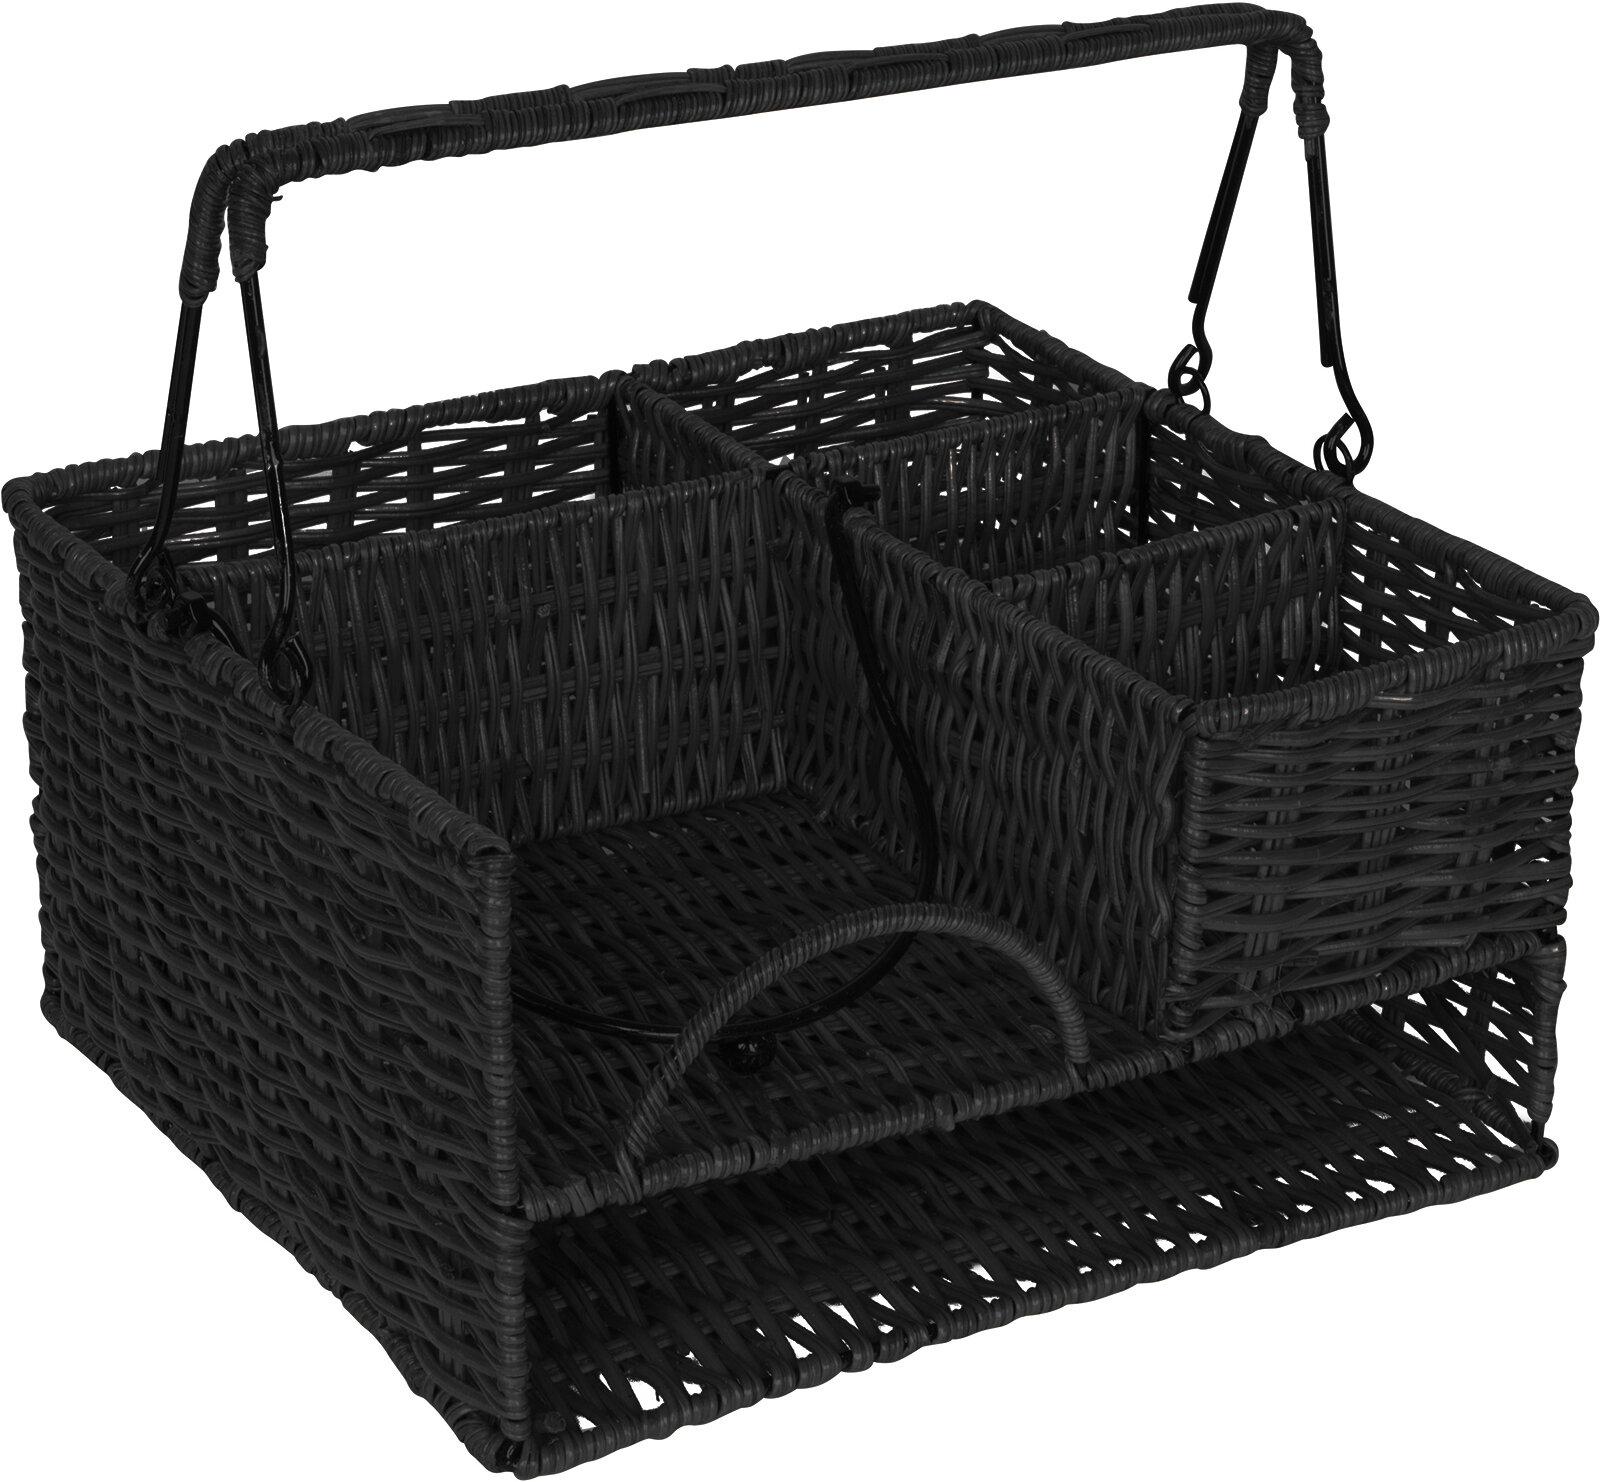 Gentil Trademark Innovations Rattan Tabletop Caddy U0026 Reviews | Wayfair